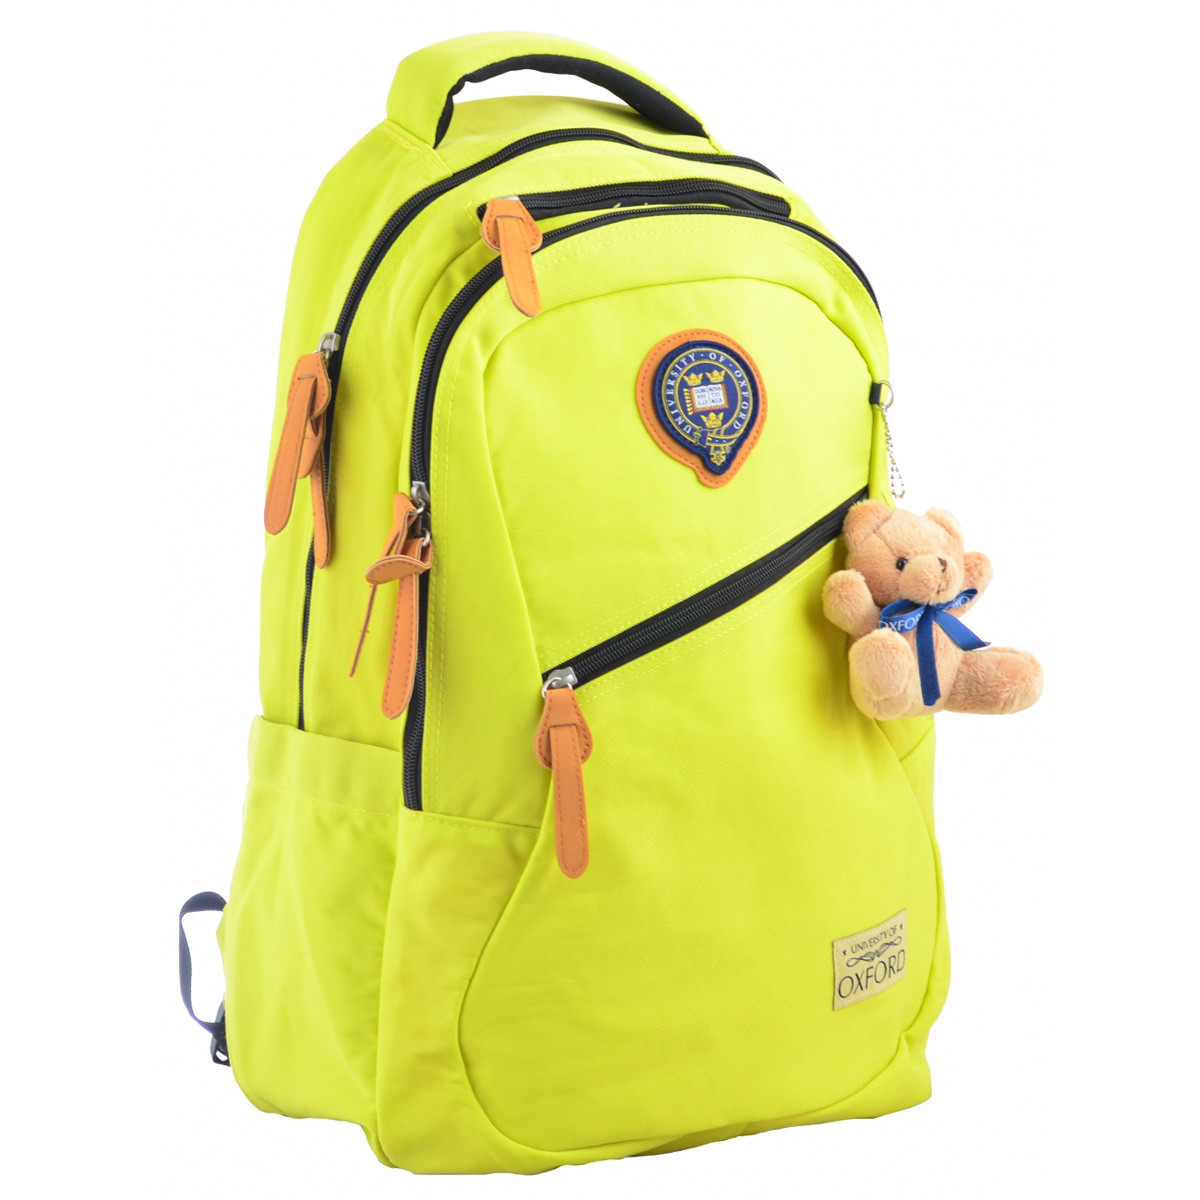 Рюкзак молодежный YES OX 405, 47*31*12.5, желтый 555685